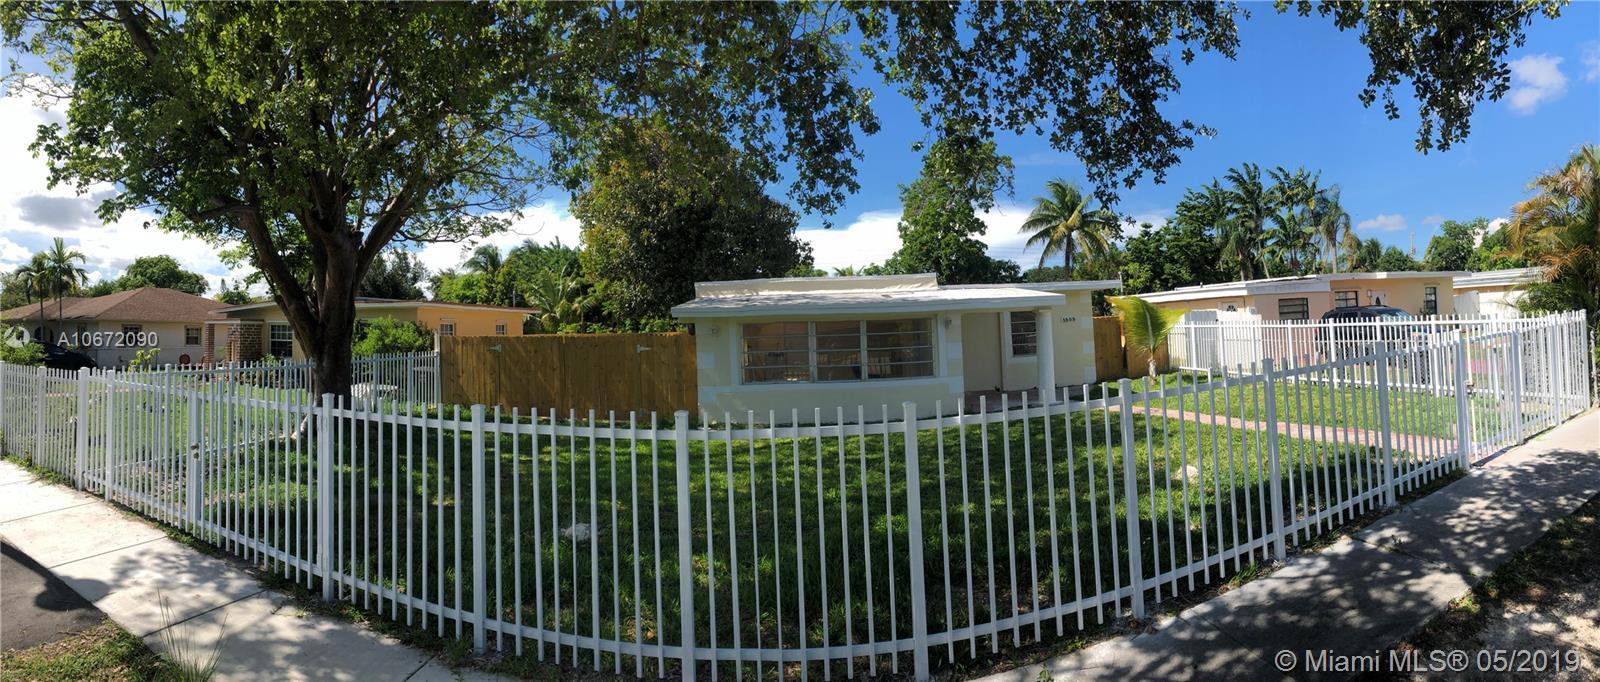 1555 NW 122nd St, North Miami, FL 33167